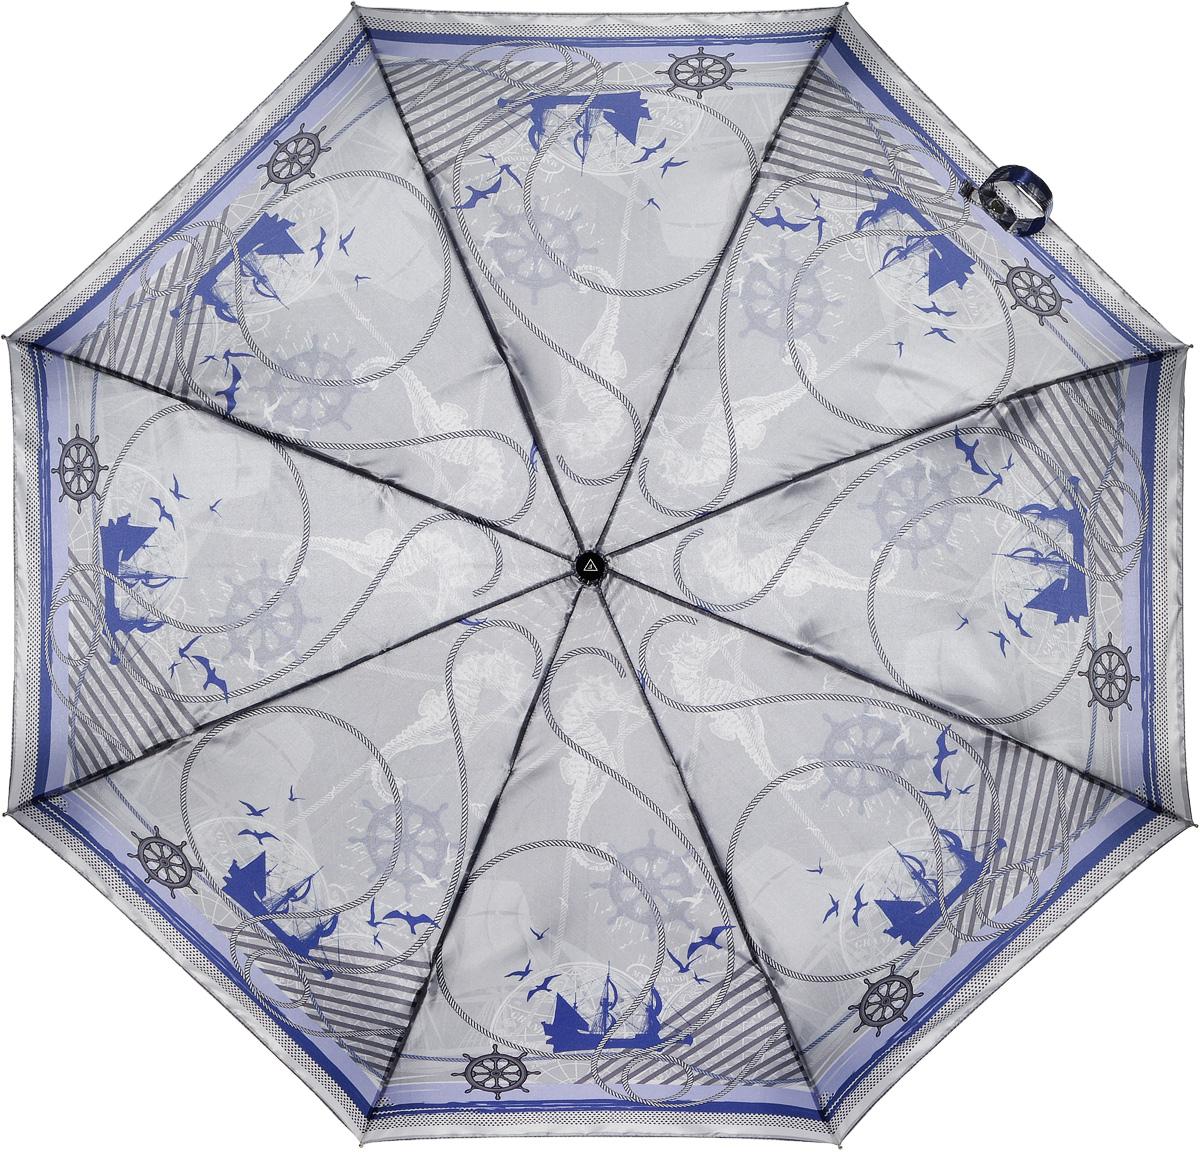 Зонт женский Fabretti, автомат, 3 сложения, цвет: мультиколор. L-16105-3L-16105-3Зонт женский Fabretti, облегченный суперавтомат, 3 сложения